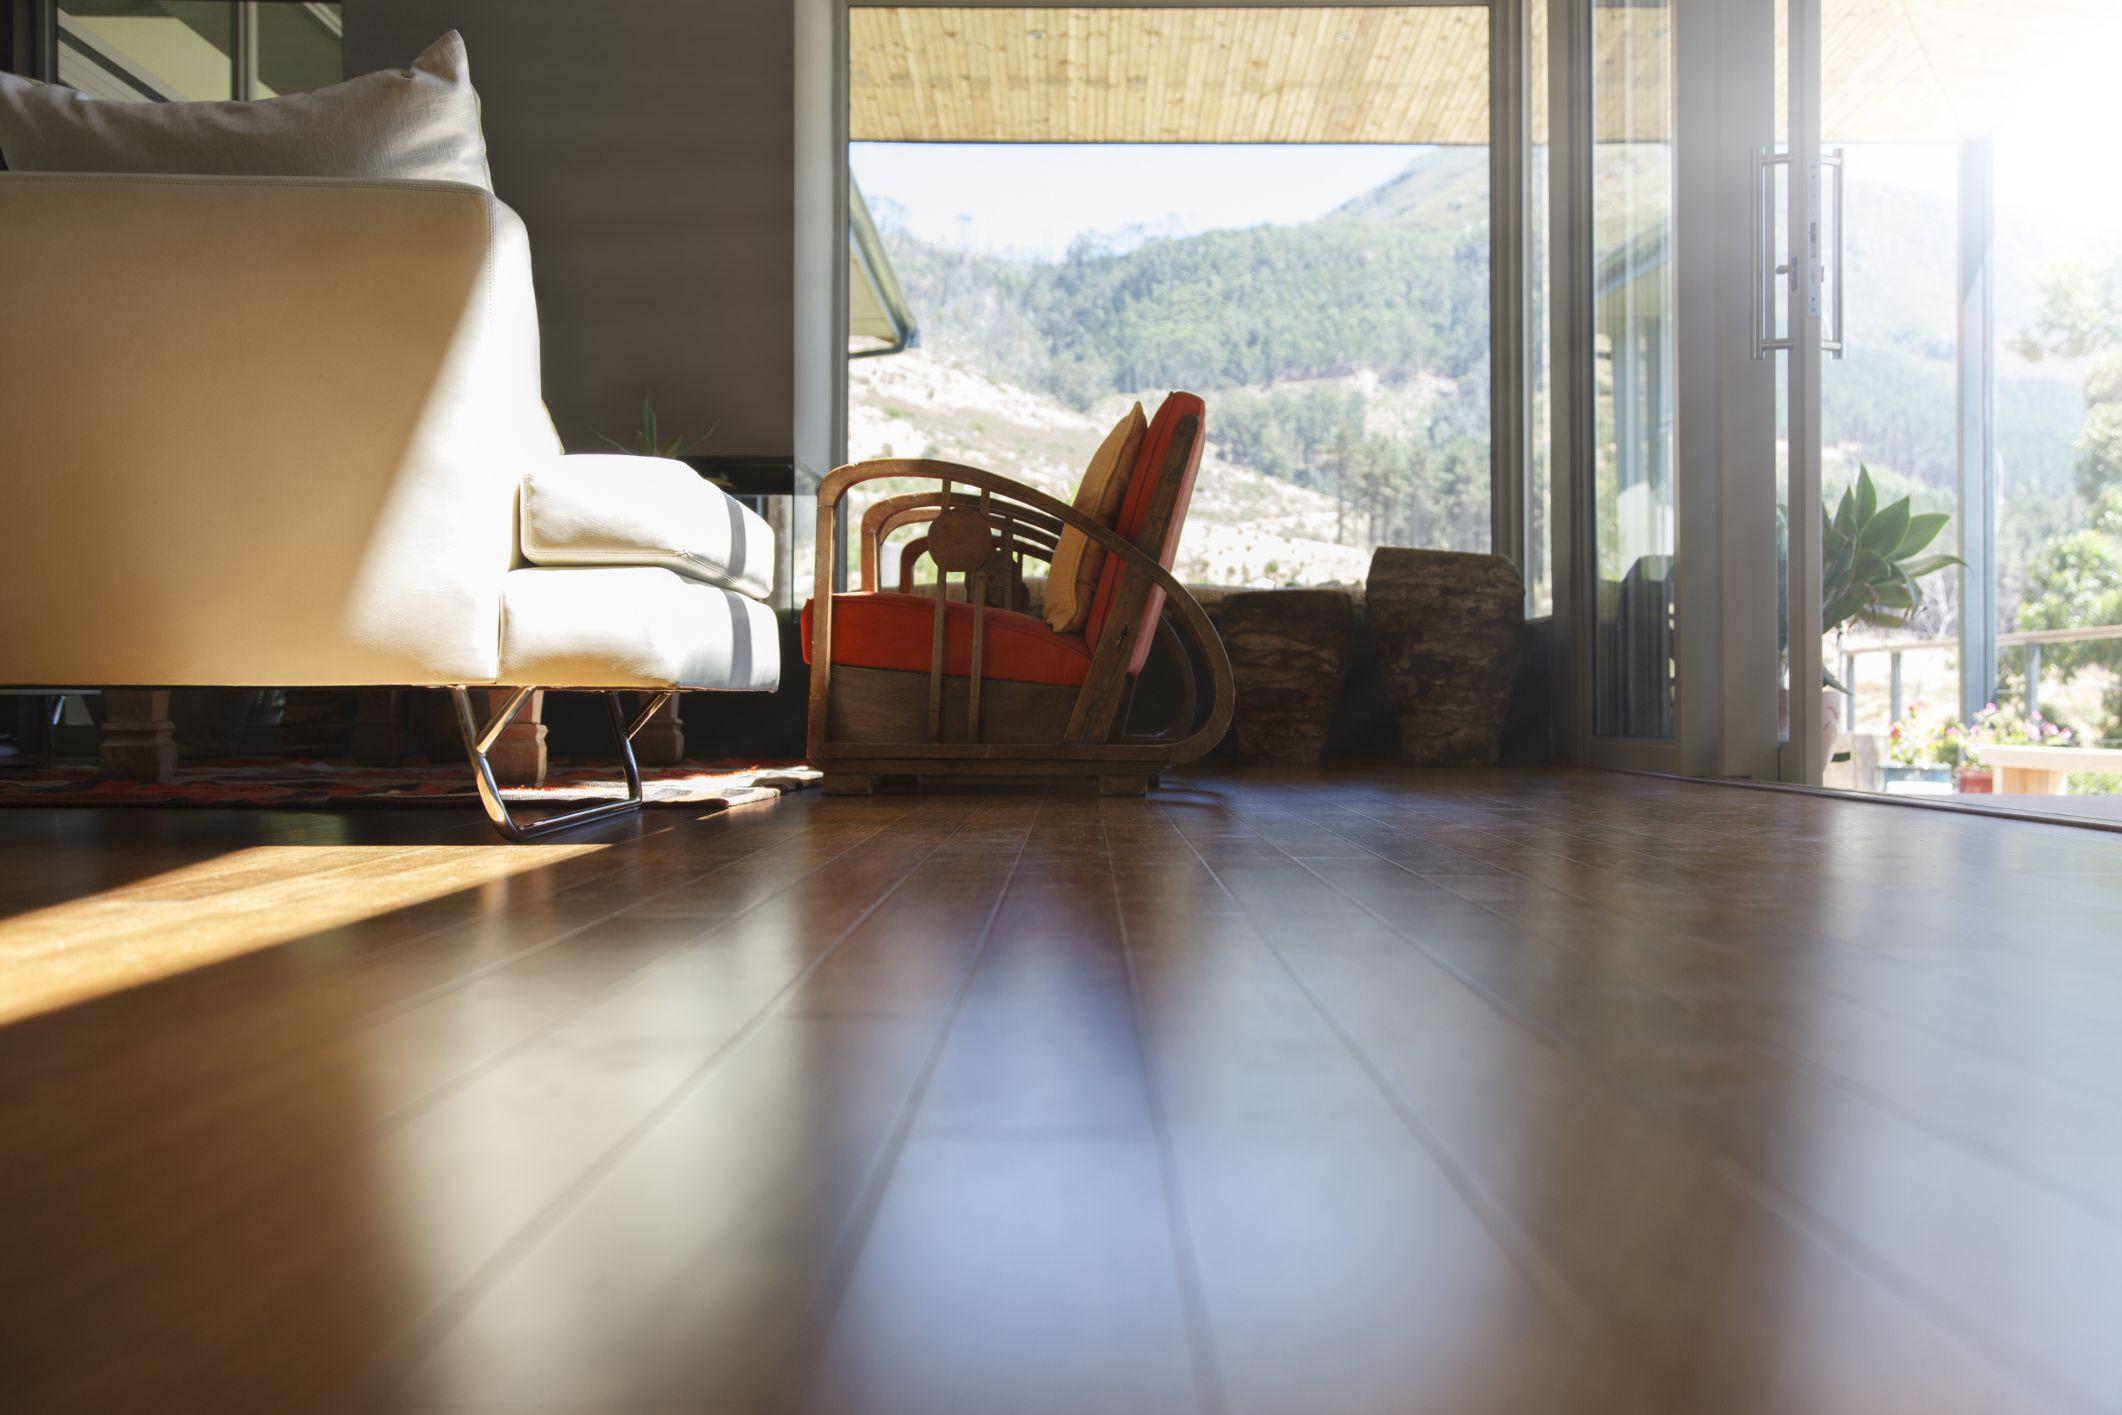 oak hardwood flooring pros and cons of pros and cons of bellawood flooring from lumber liquidators regarding exotic hardwood flooring 525439899 56a49d3a3df78cf77283453d